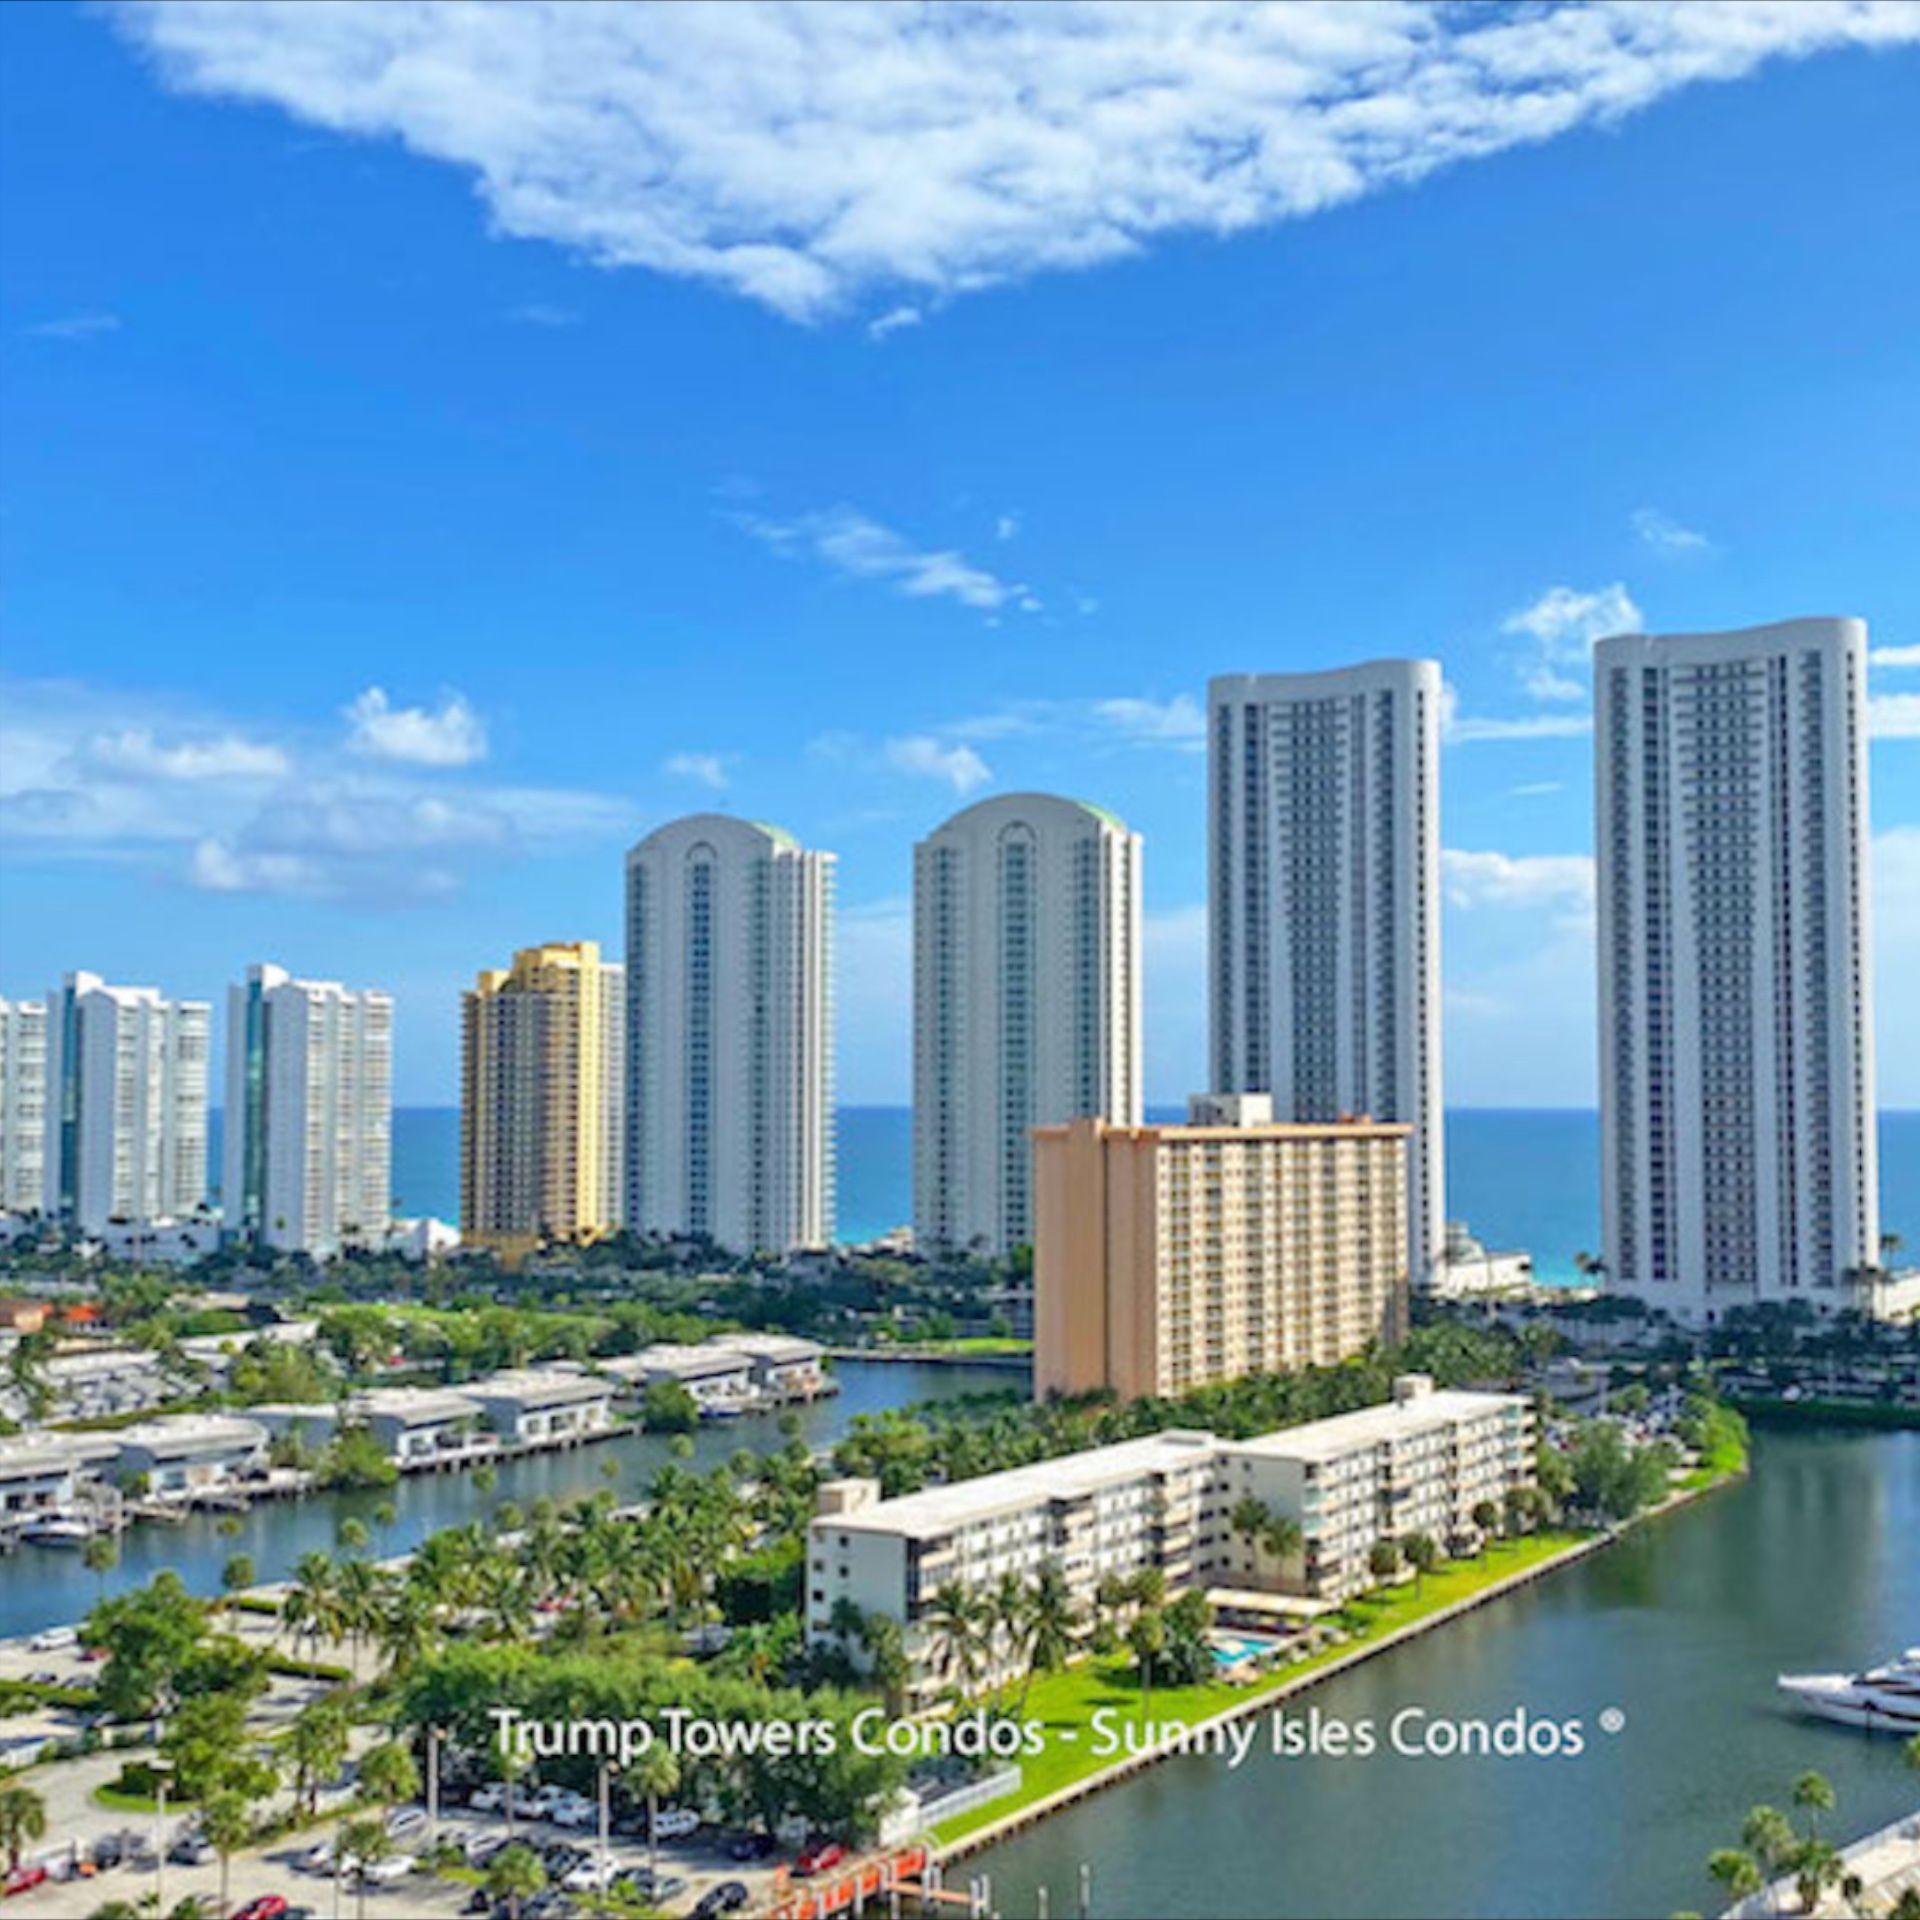 Trump Towers I Condo 16001 Collins Ave Sunny Isles Beach Fl 33160 Sunny Isles Condos Miami Beach Resort Sunny Isles Beach Oceanfront Condo